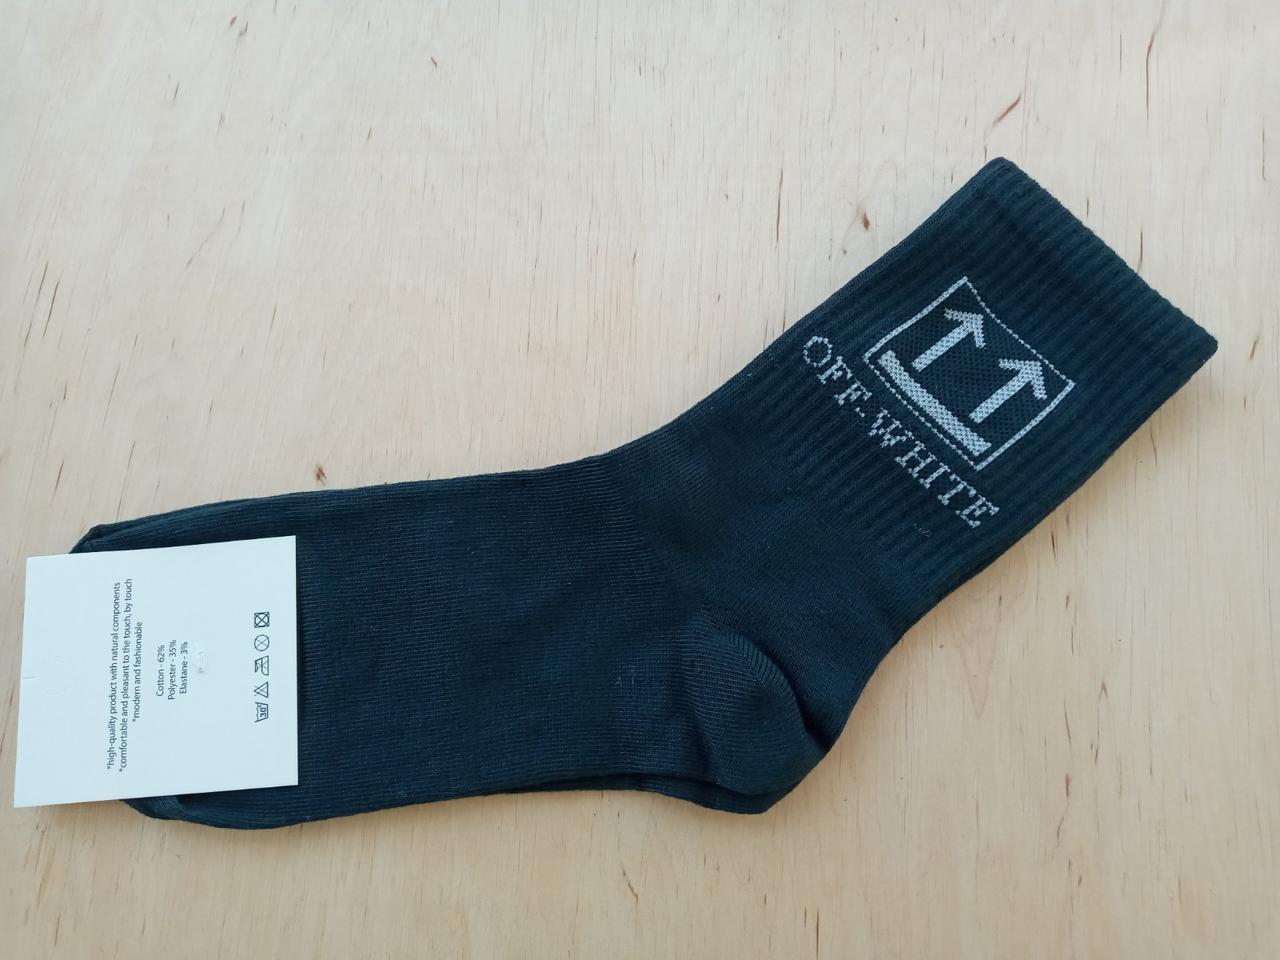 Модные молодежные носки Crazy Socks размер 39-43 OFF WHITE